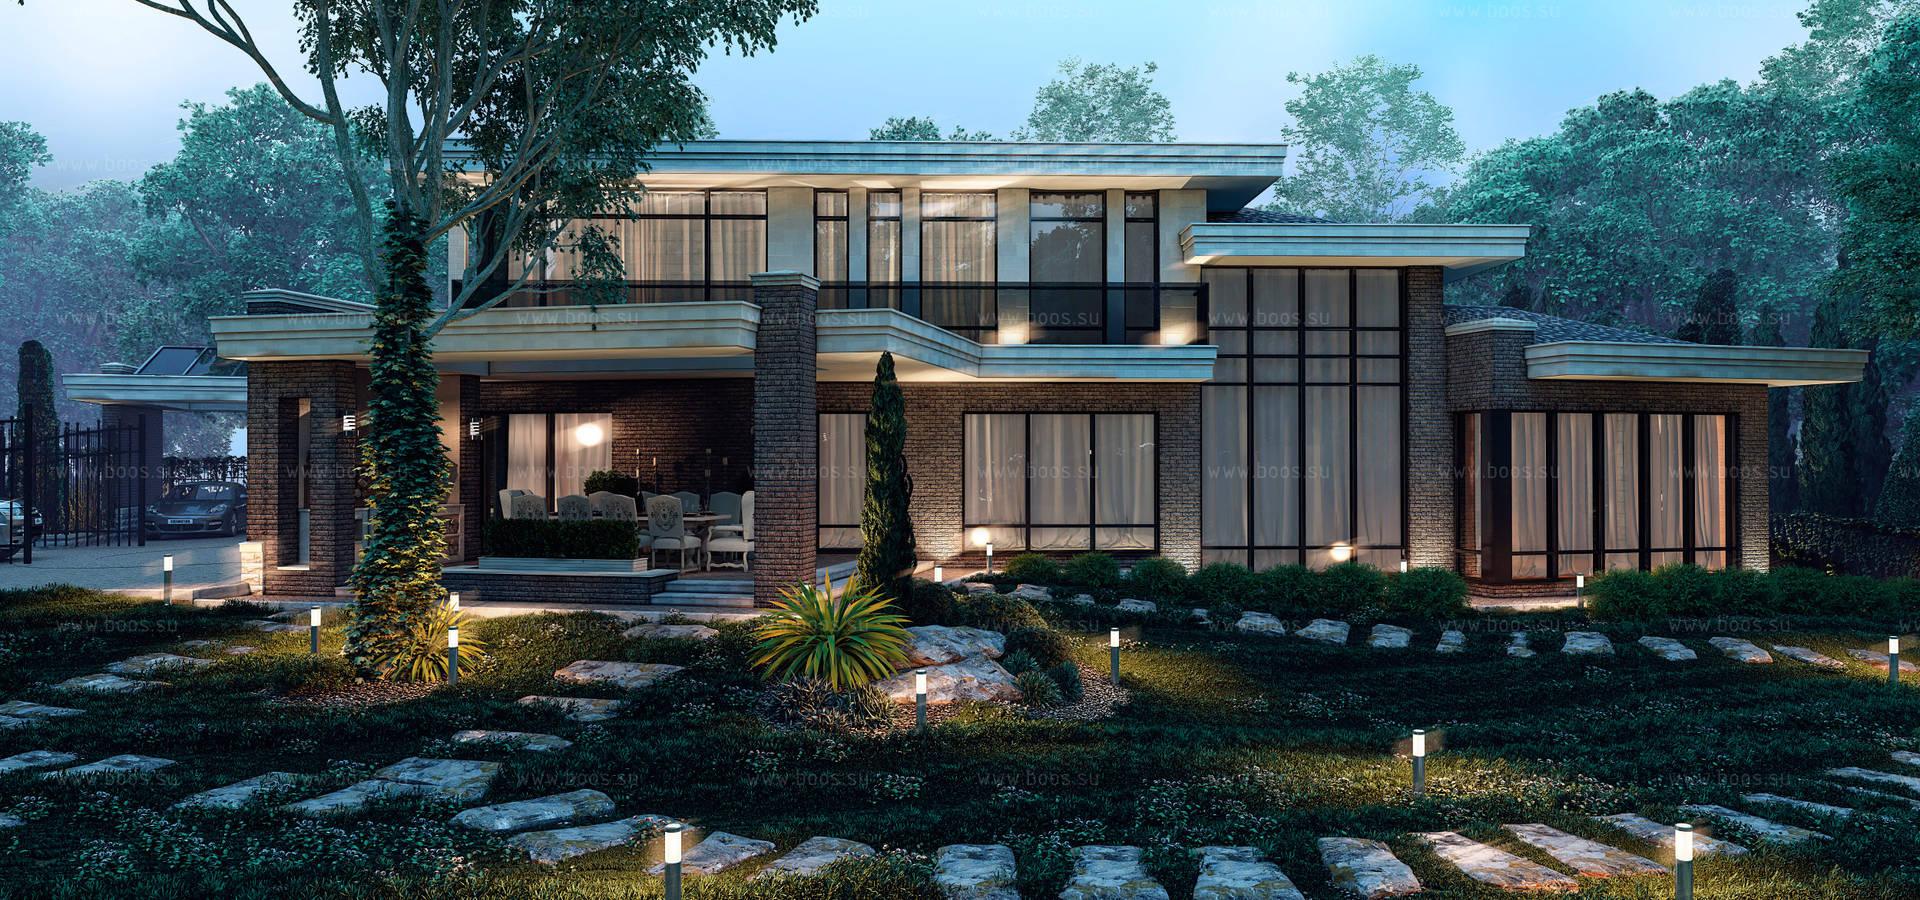 BOOS architects